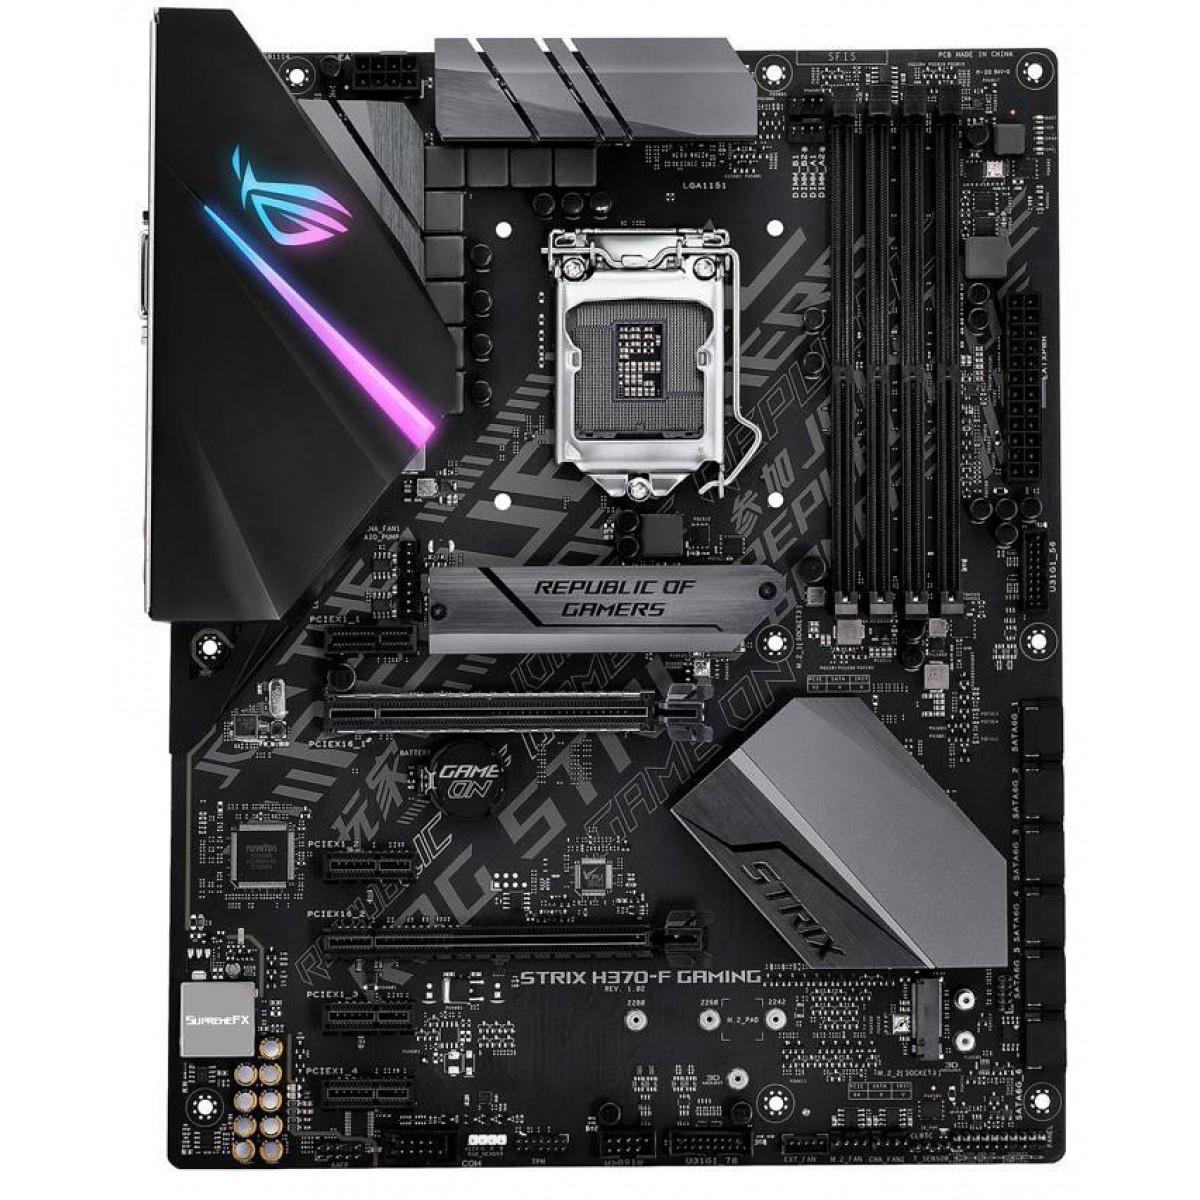 Placa Mãe Asus ROG STRIX H370-F Gaming, Chipset H370, Intel LGA 1151, ATX, DDR4